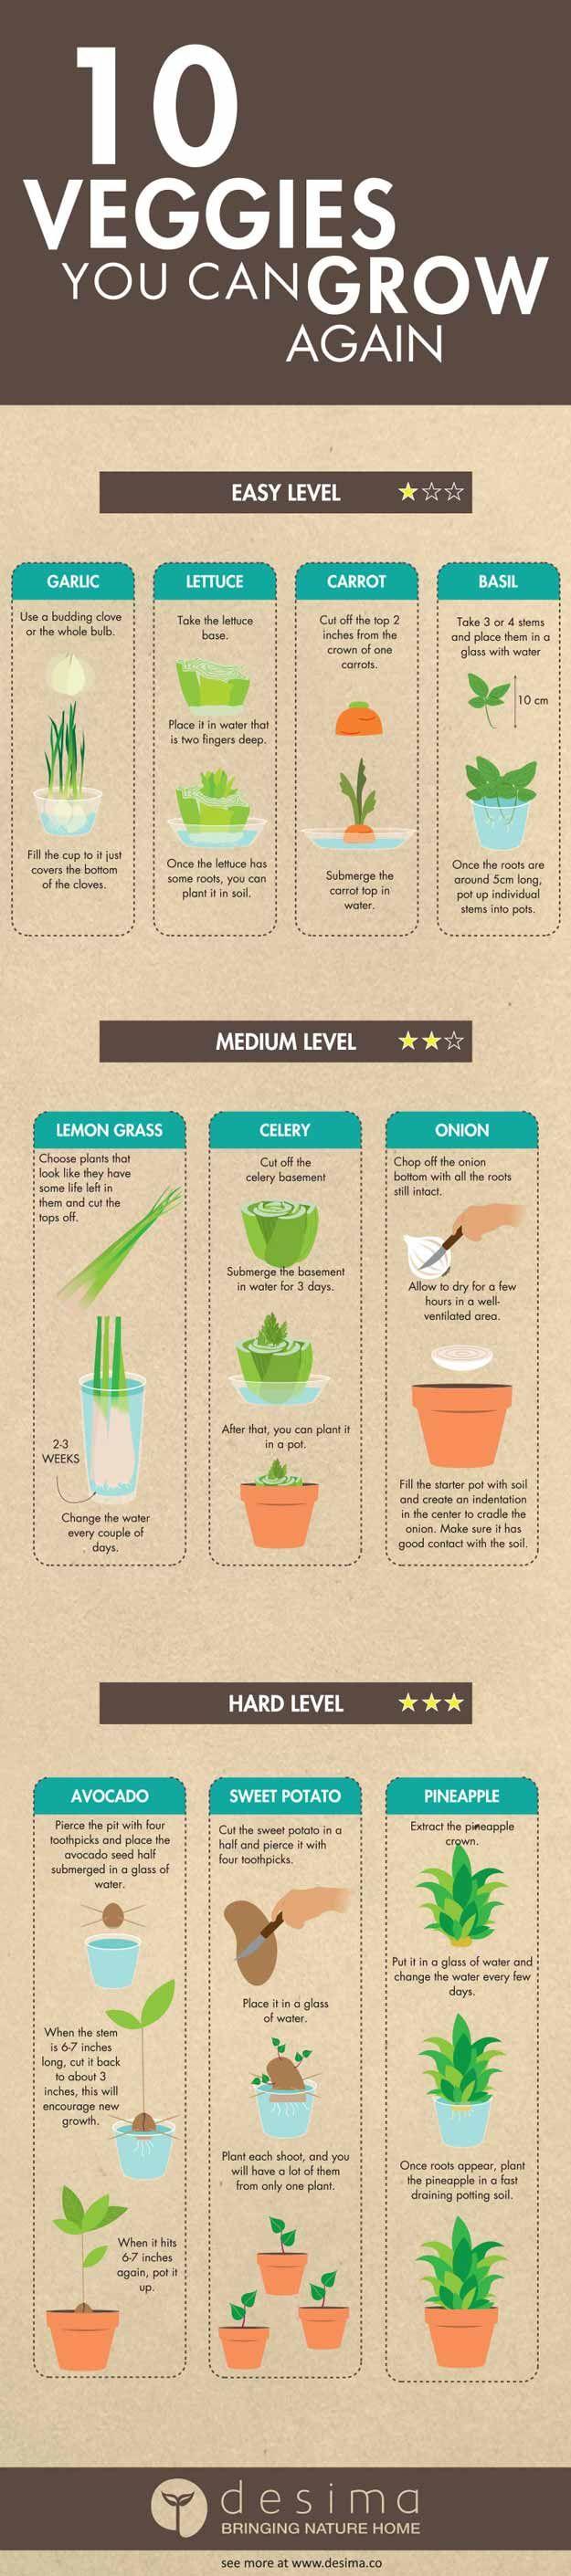 best 25 regrow vegetables ideas on pinterest growing vegetables